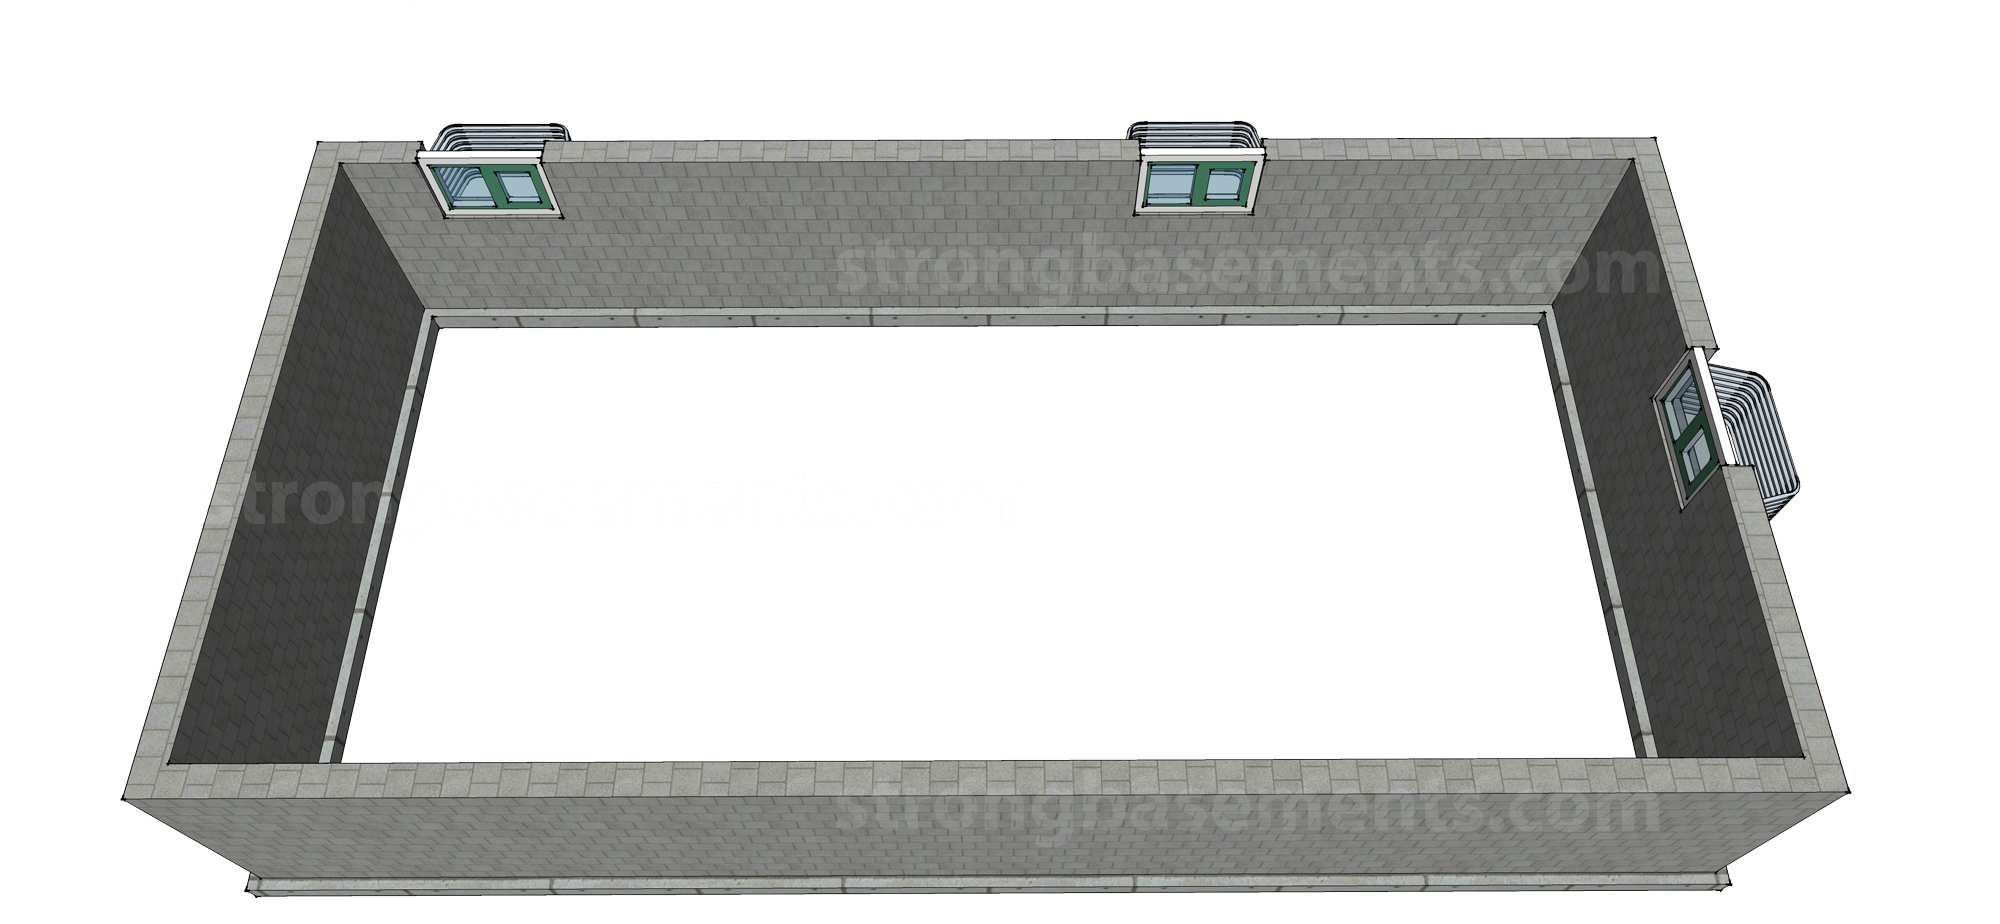 Interior-Basement-Waterproofing-Step-1